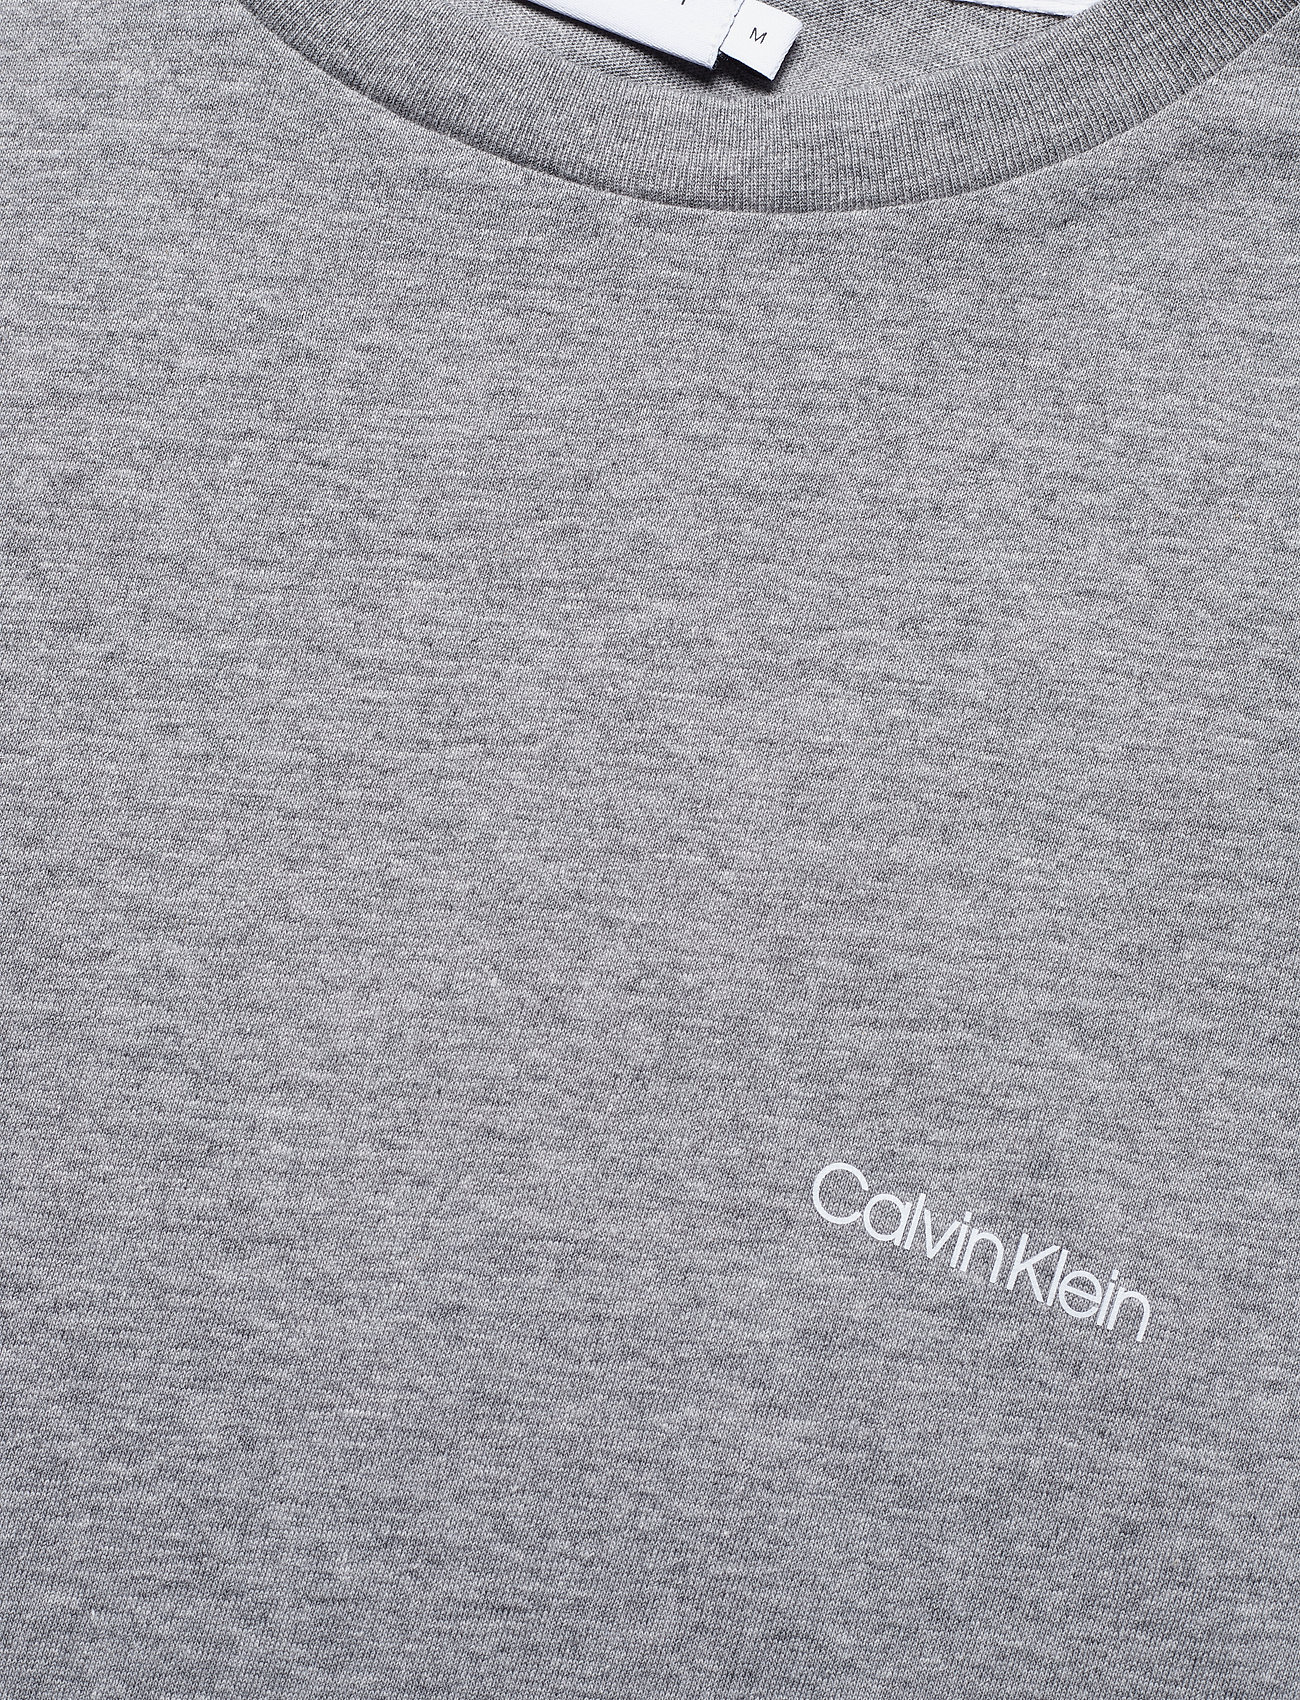 Calvin Klein - COTTON CHEST LOGO T-SHIRT - basic t-shirts - mid grey heather - 2